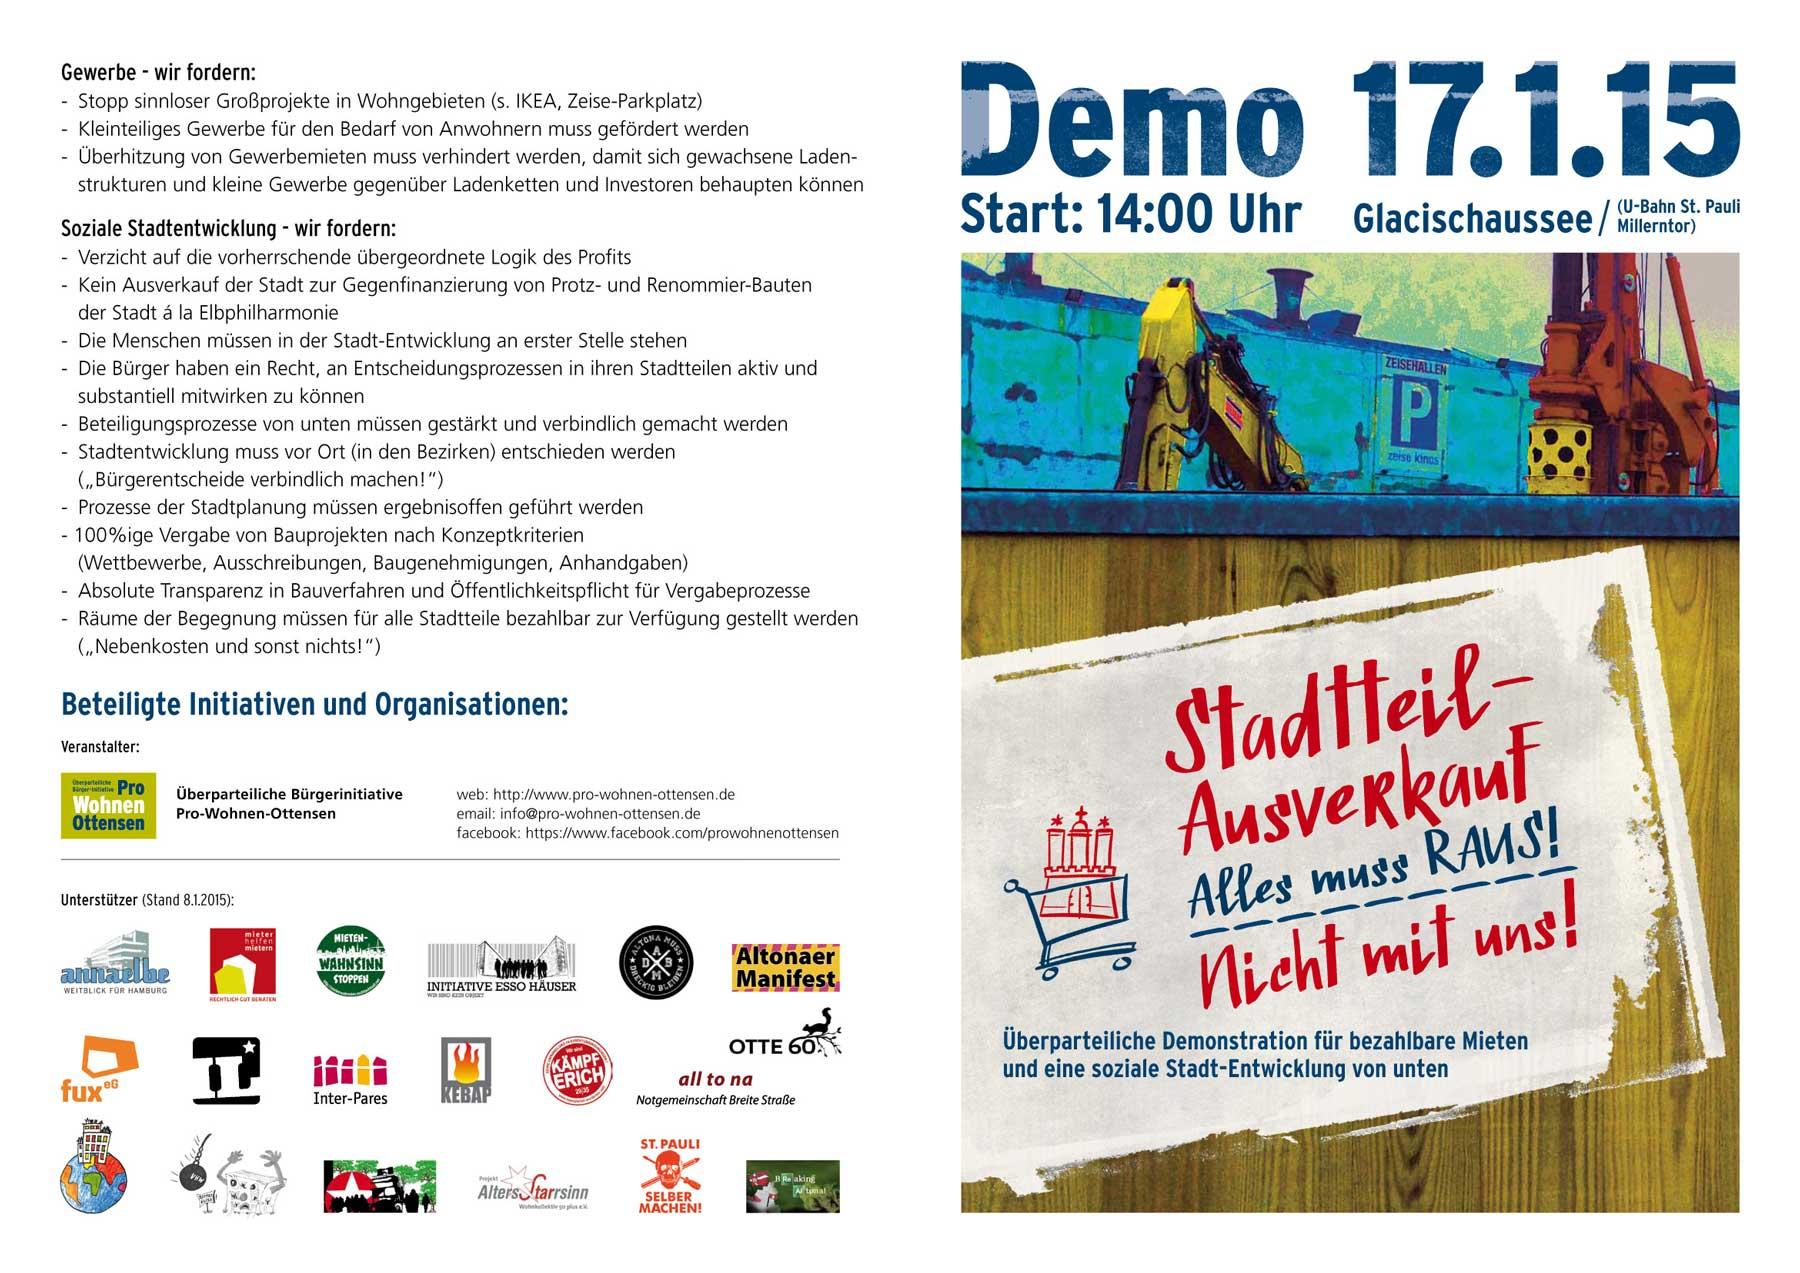 Flyer: Anti-Gentrifizierungs-Demo am 17. Januar 2015 in Hamburg